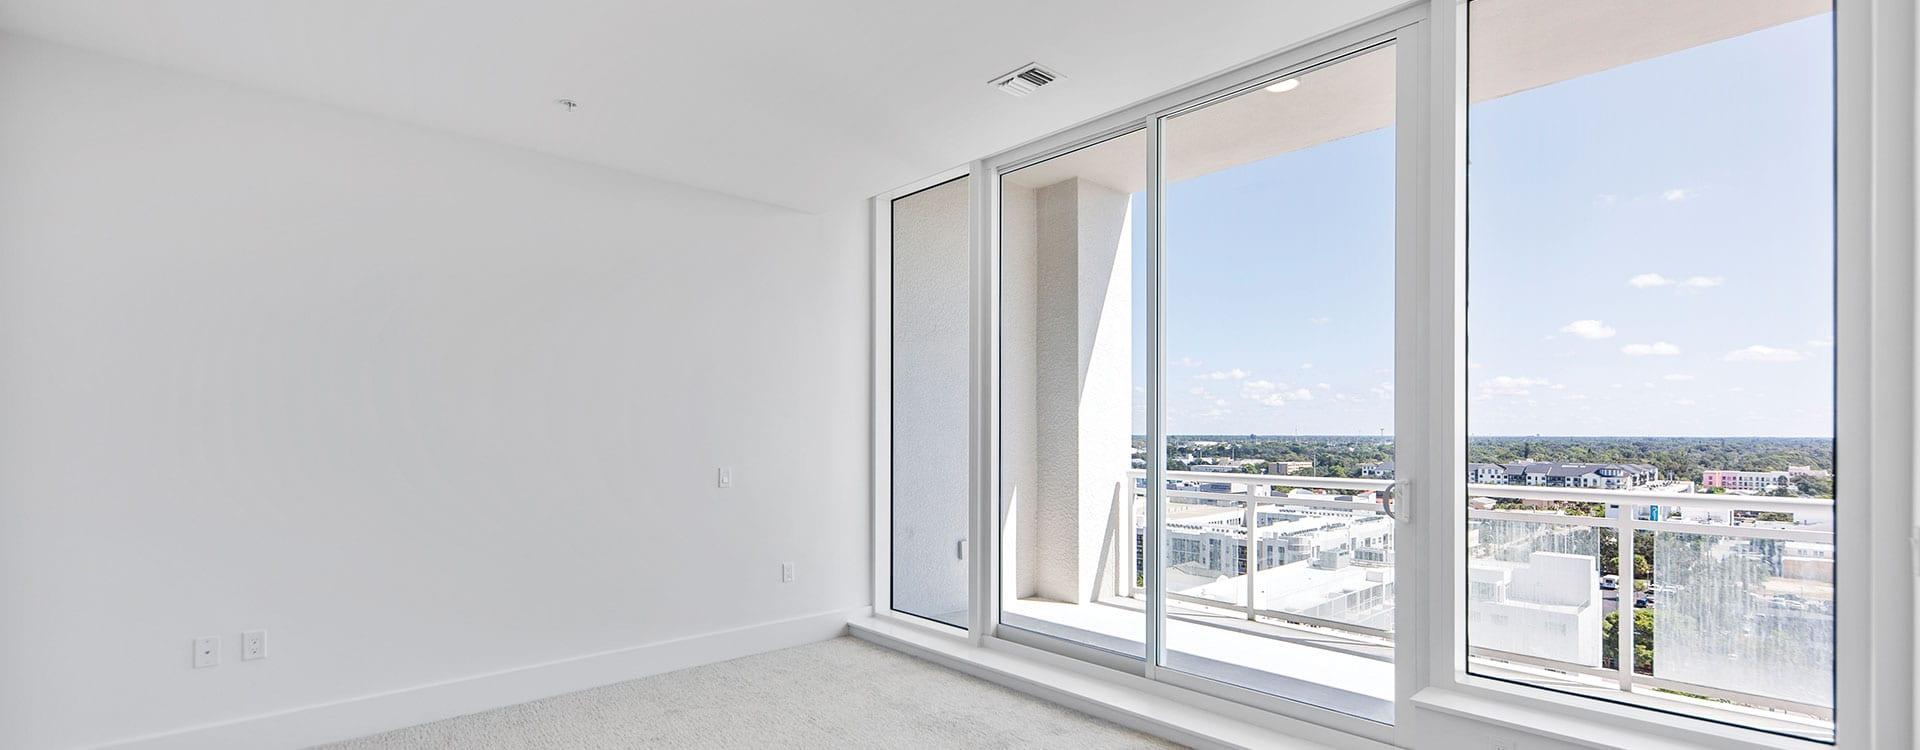 BLVD Residence 1204 Bedroom